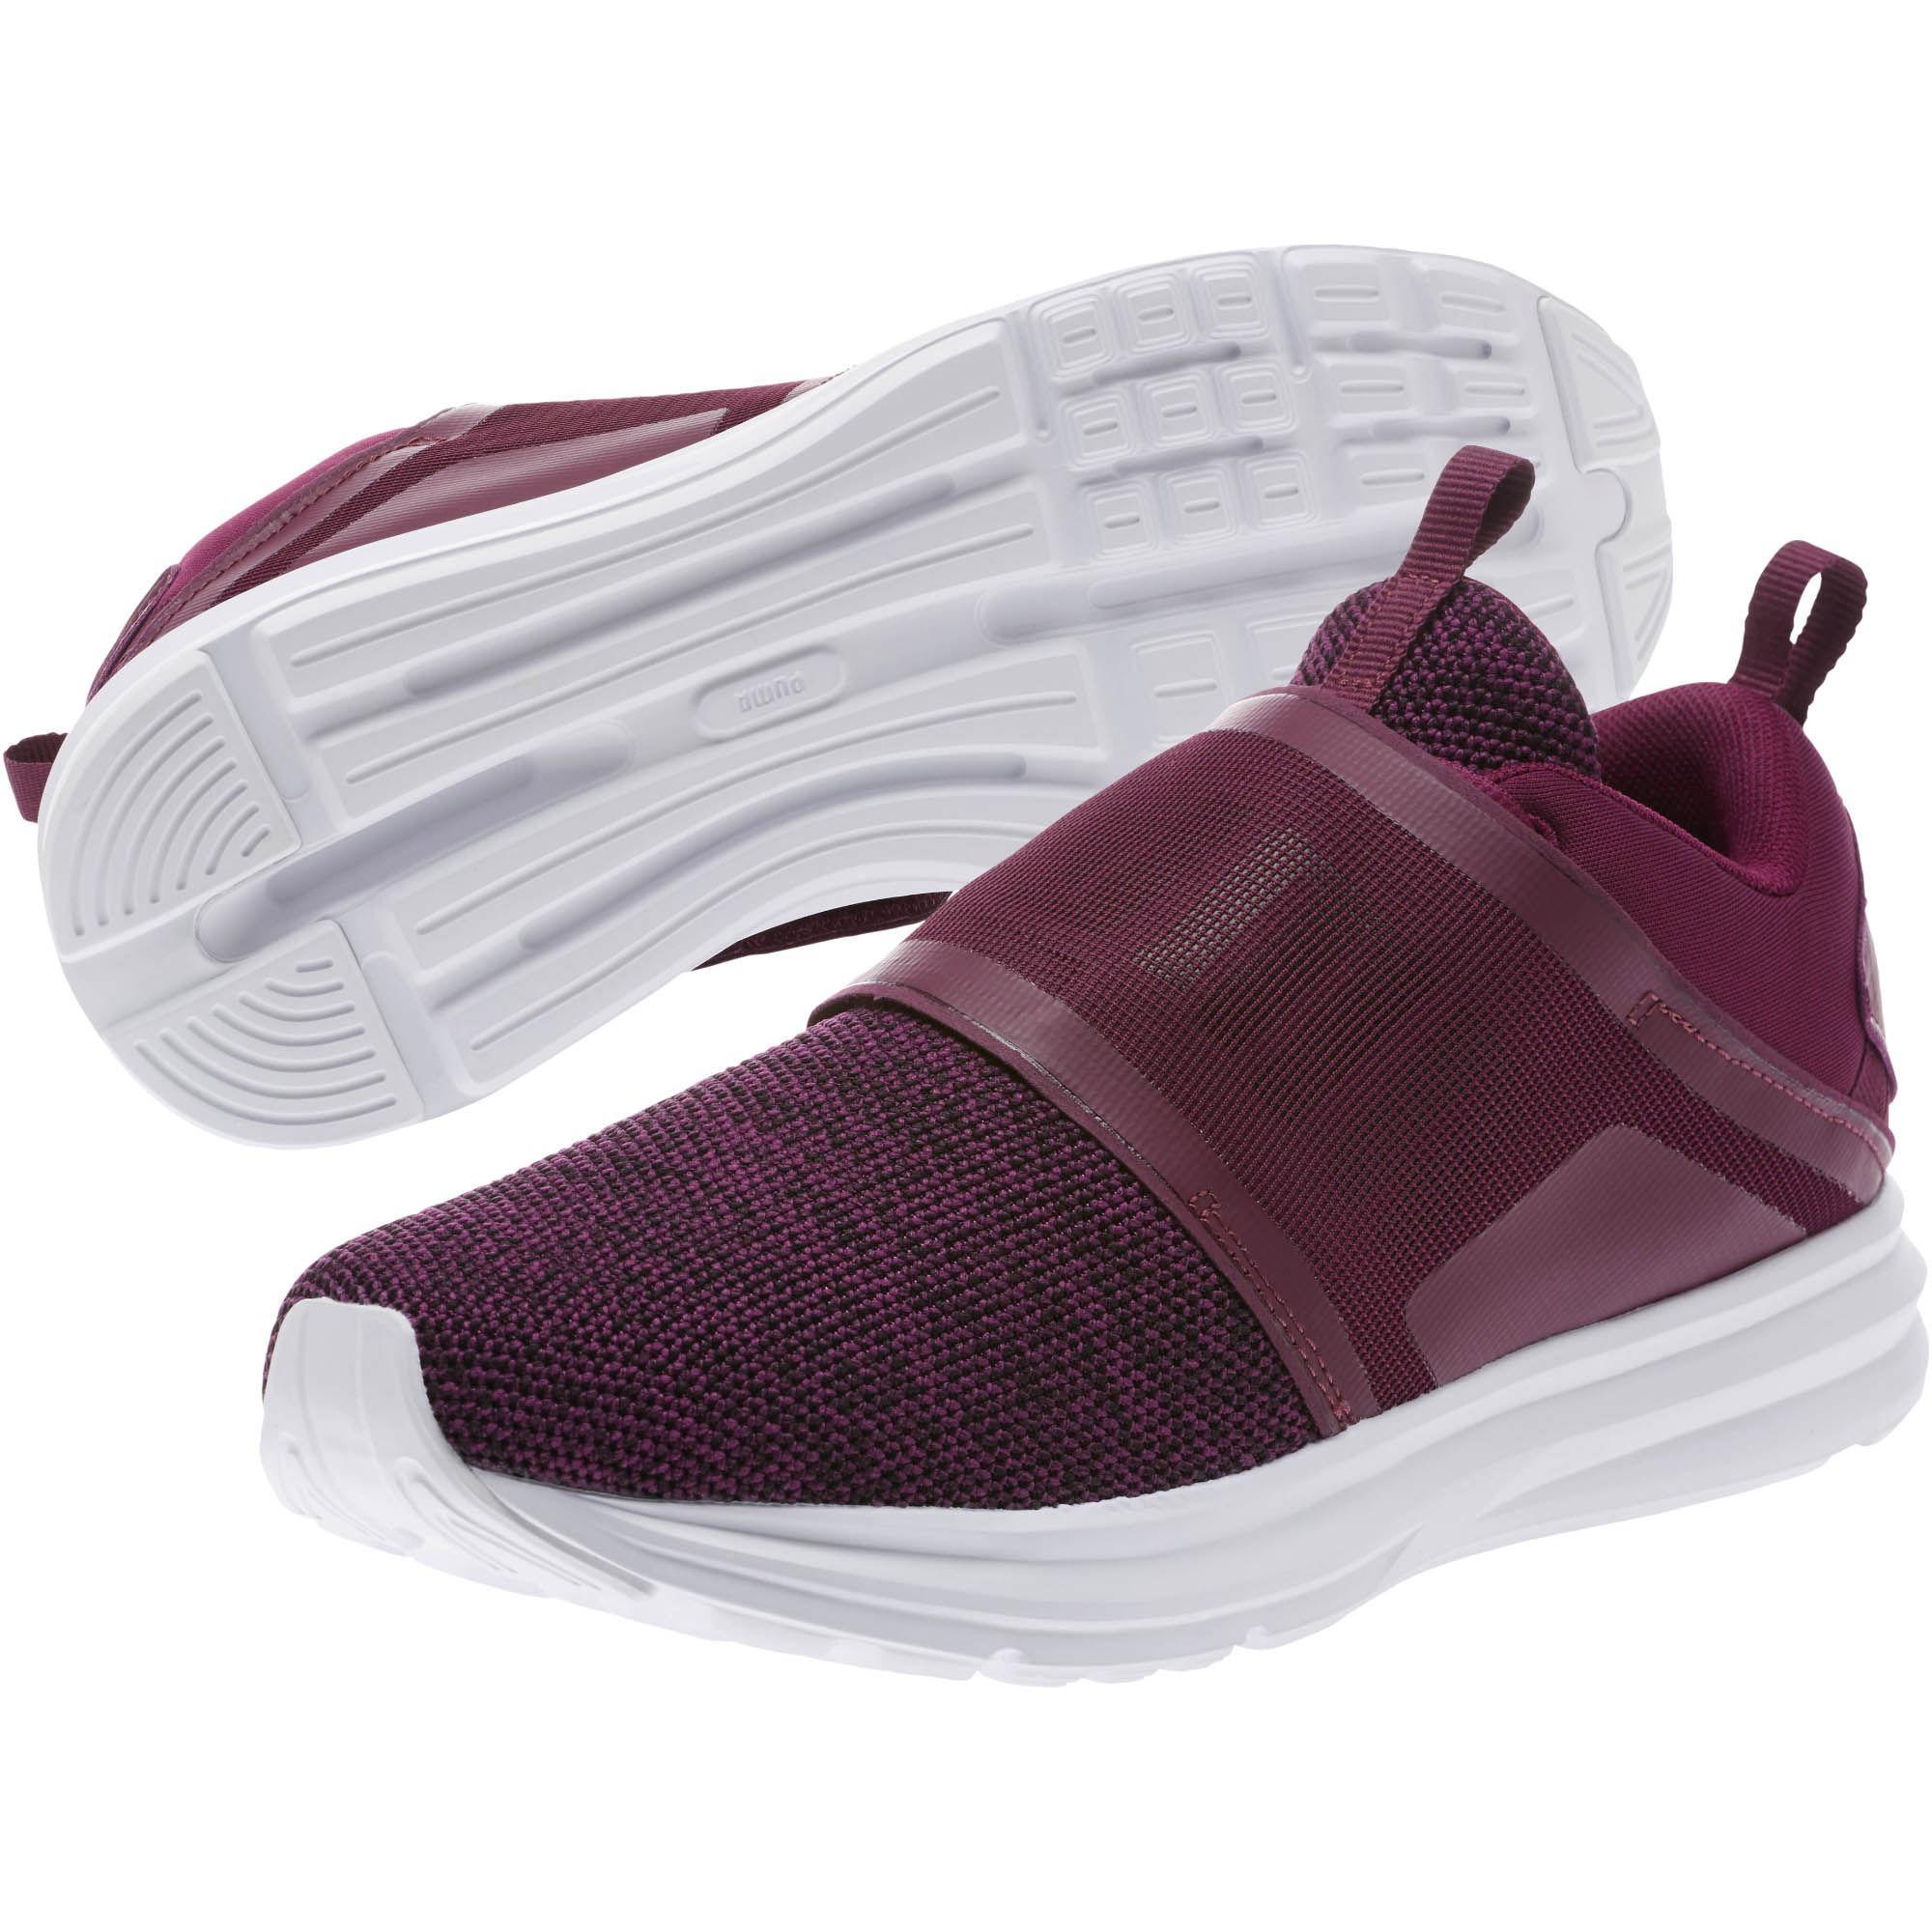 417e11b12ff Lyst - PUMA Enzo Strap Knit Women s Running Shoes in Purple